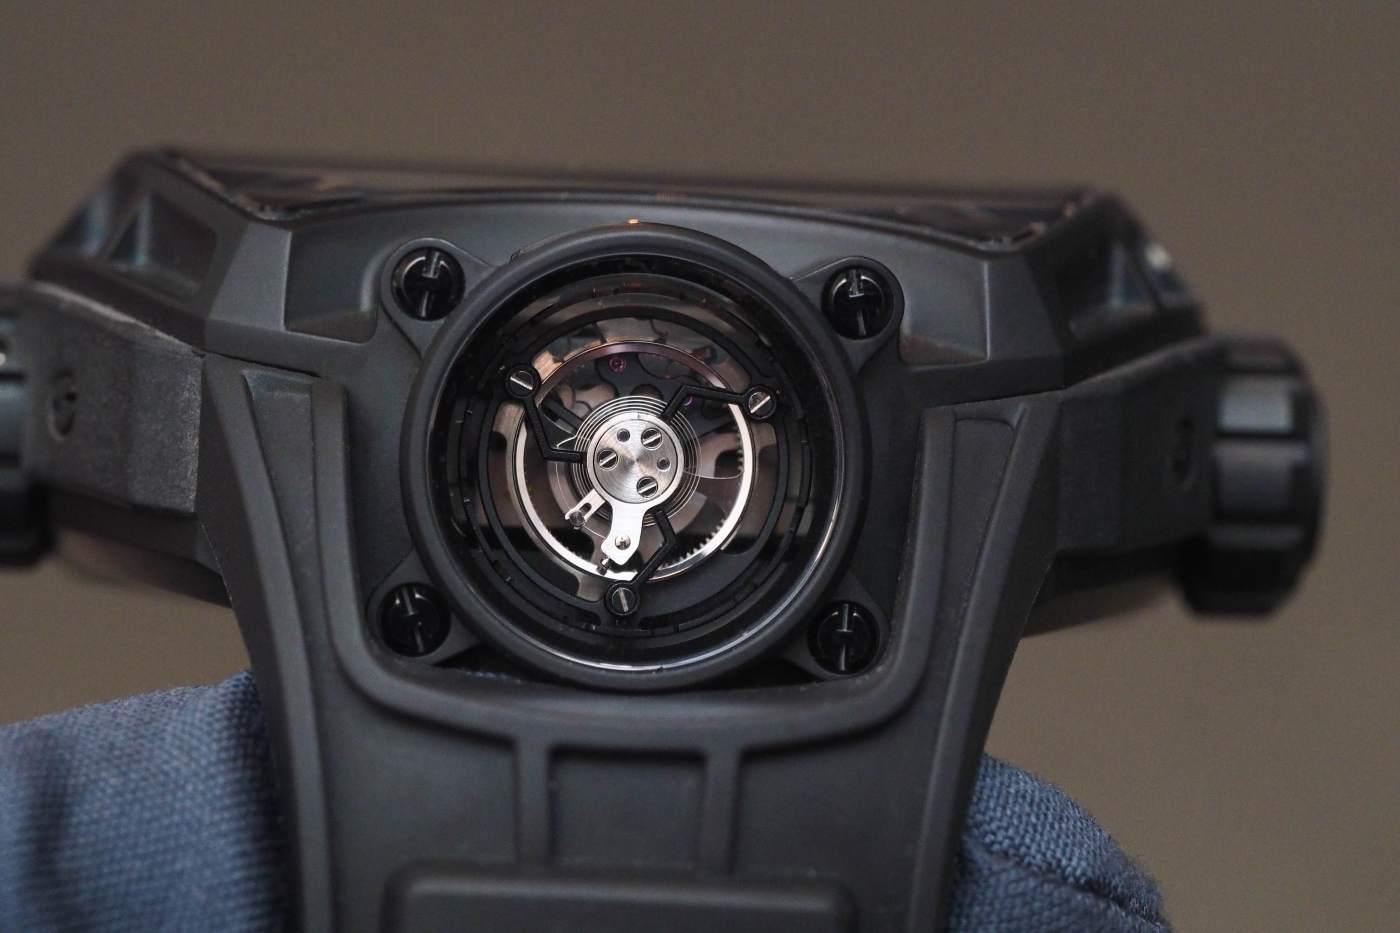 Hublot MP-12 Key of Time Skeleton